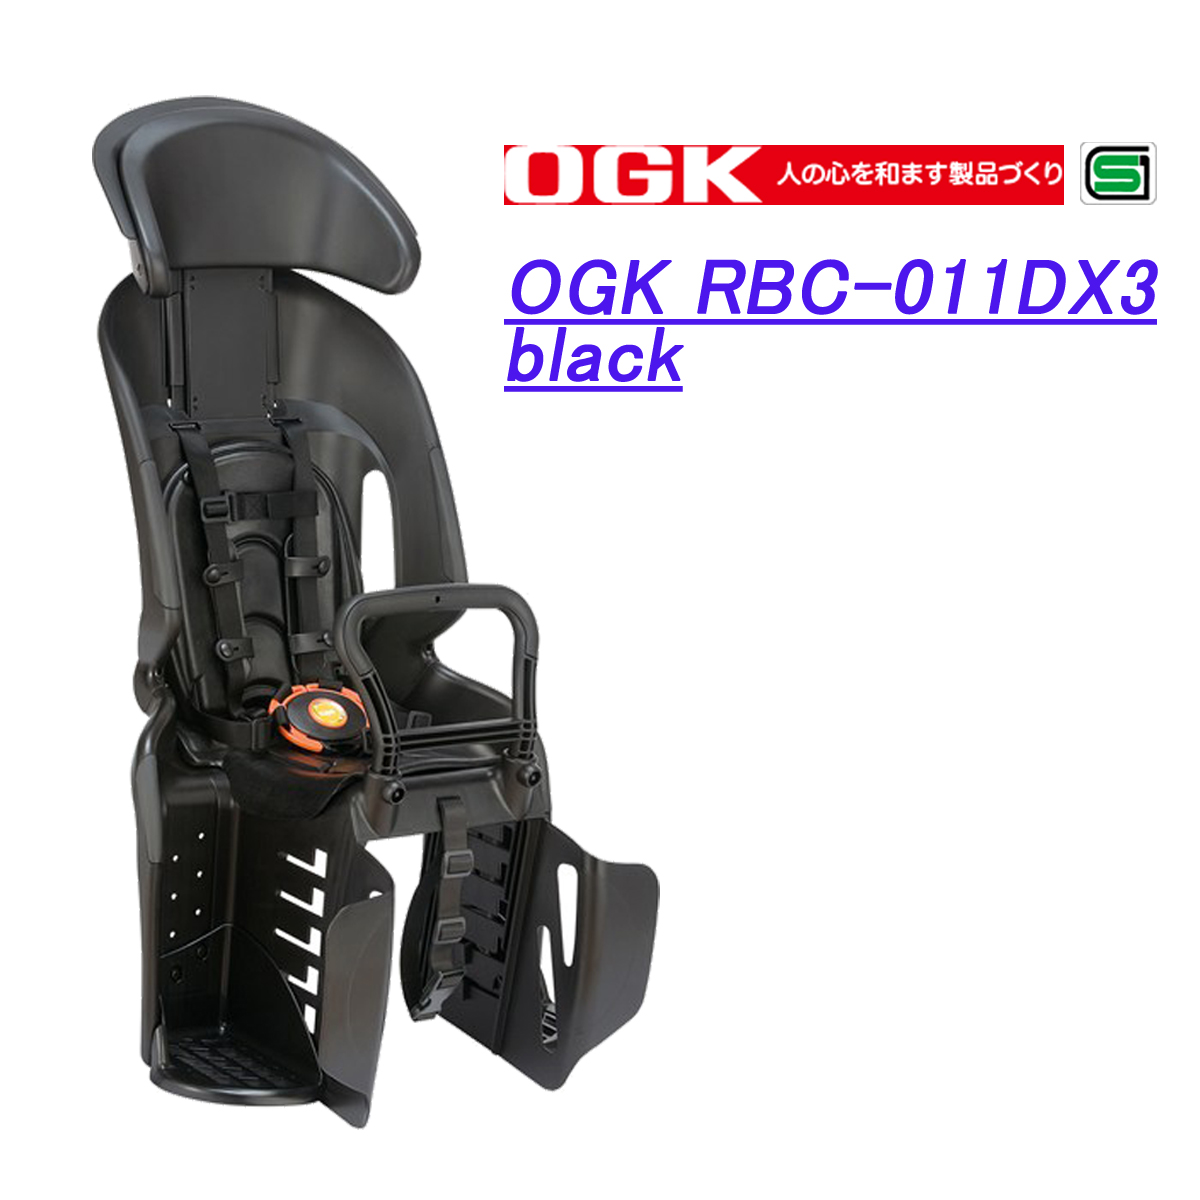 OGK RBC-011DX3 チャイルドシート 後ろ子供のせ ブラック オージーケー